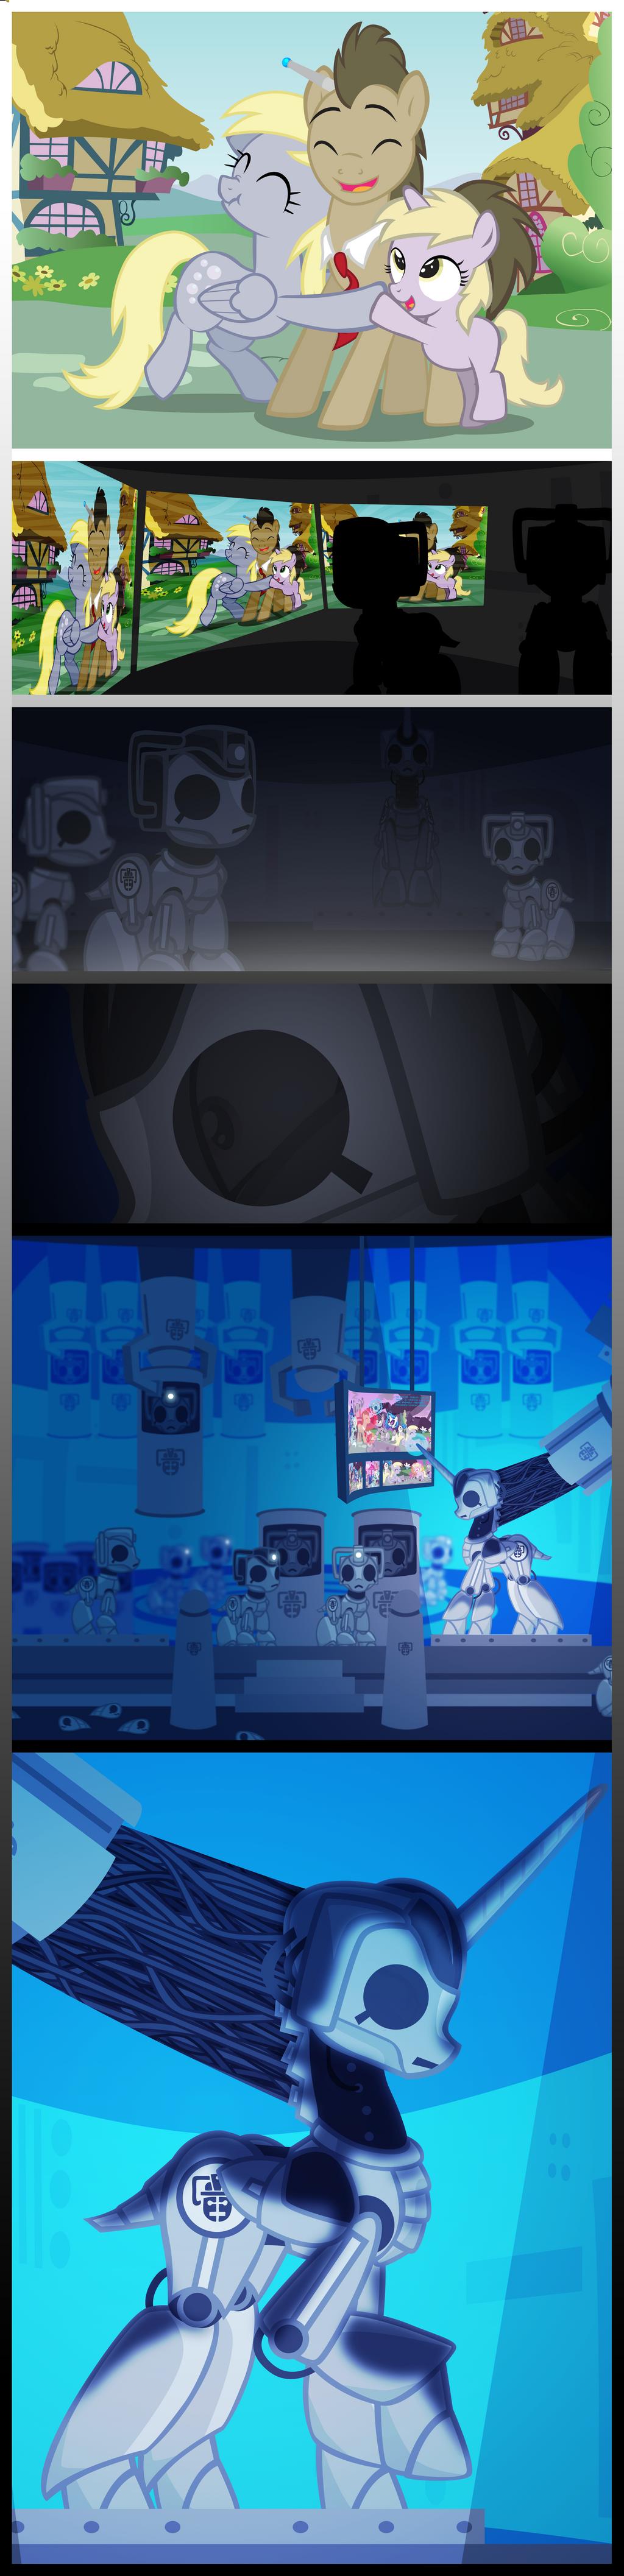 Cyber Control by Trotsworth